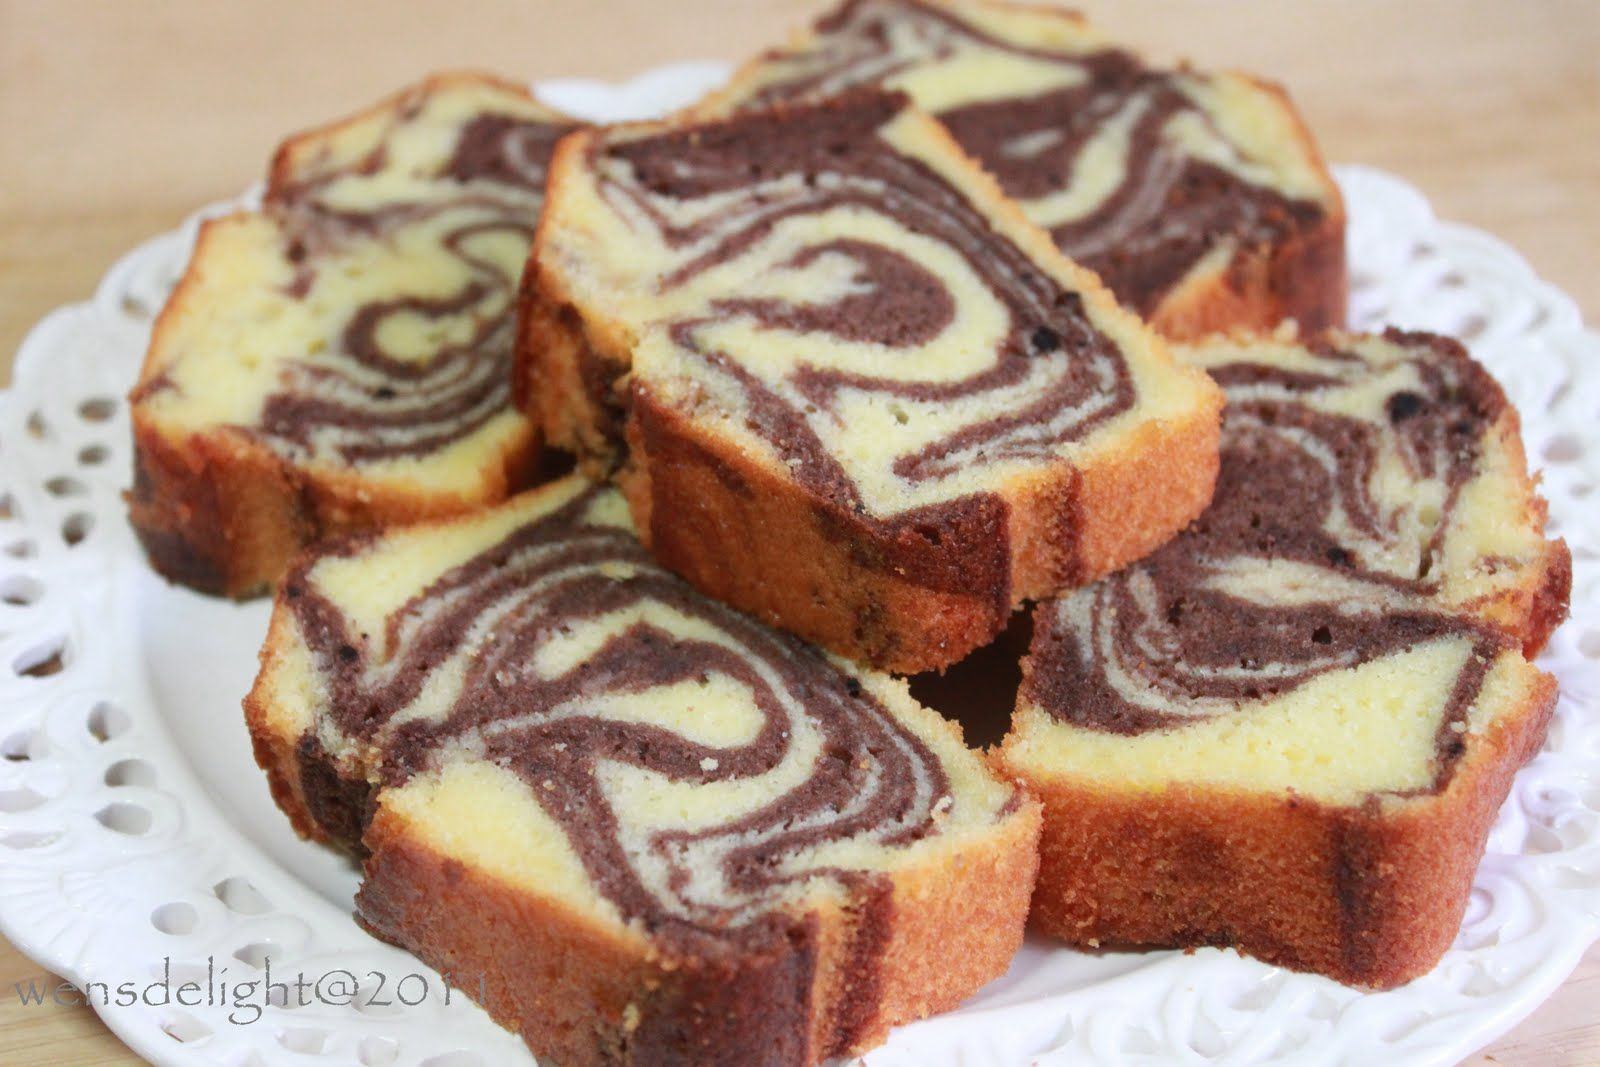 Picture 1584 Jpg 1600 1067 Cake Recipes Lemon Sour Cream Cake Desserts